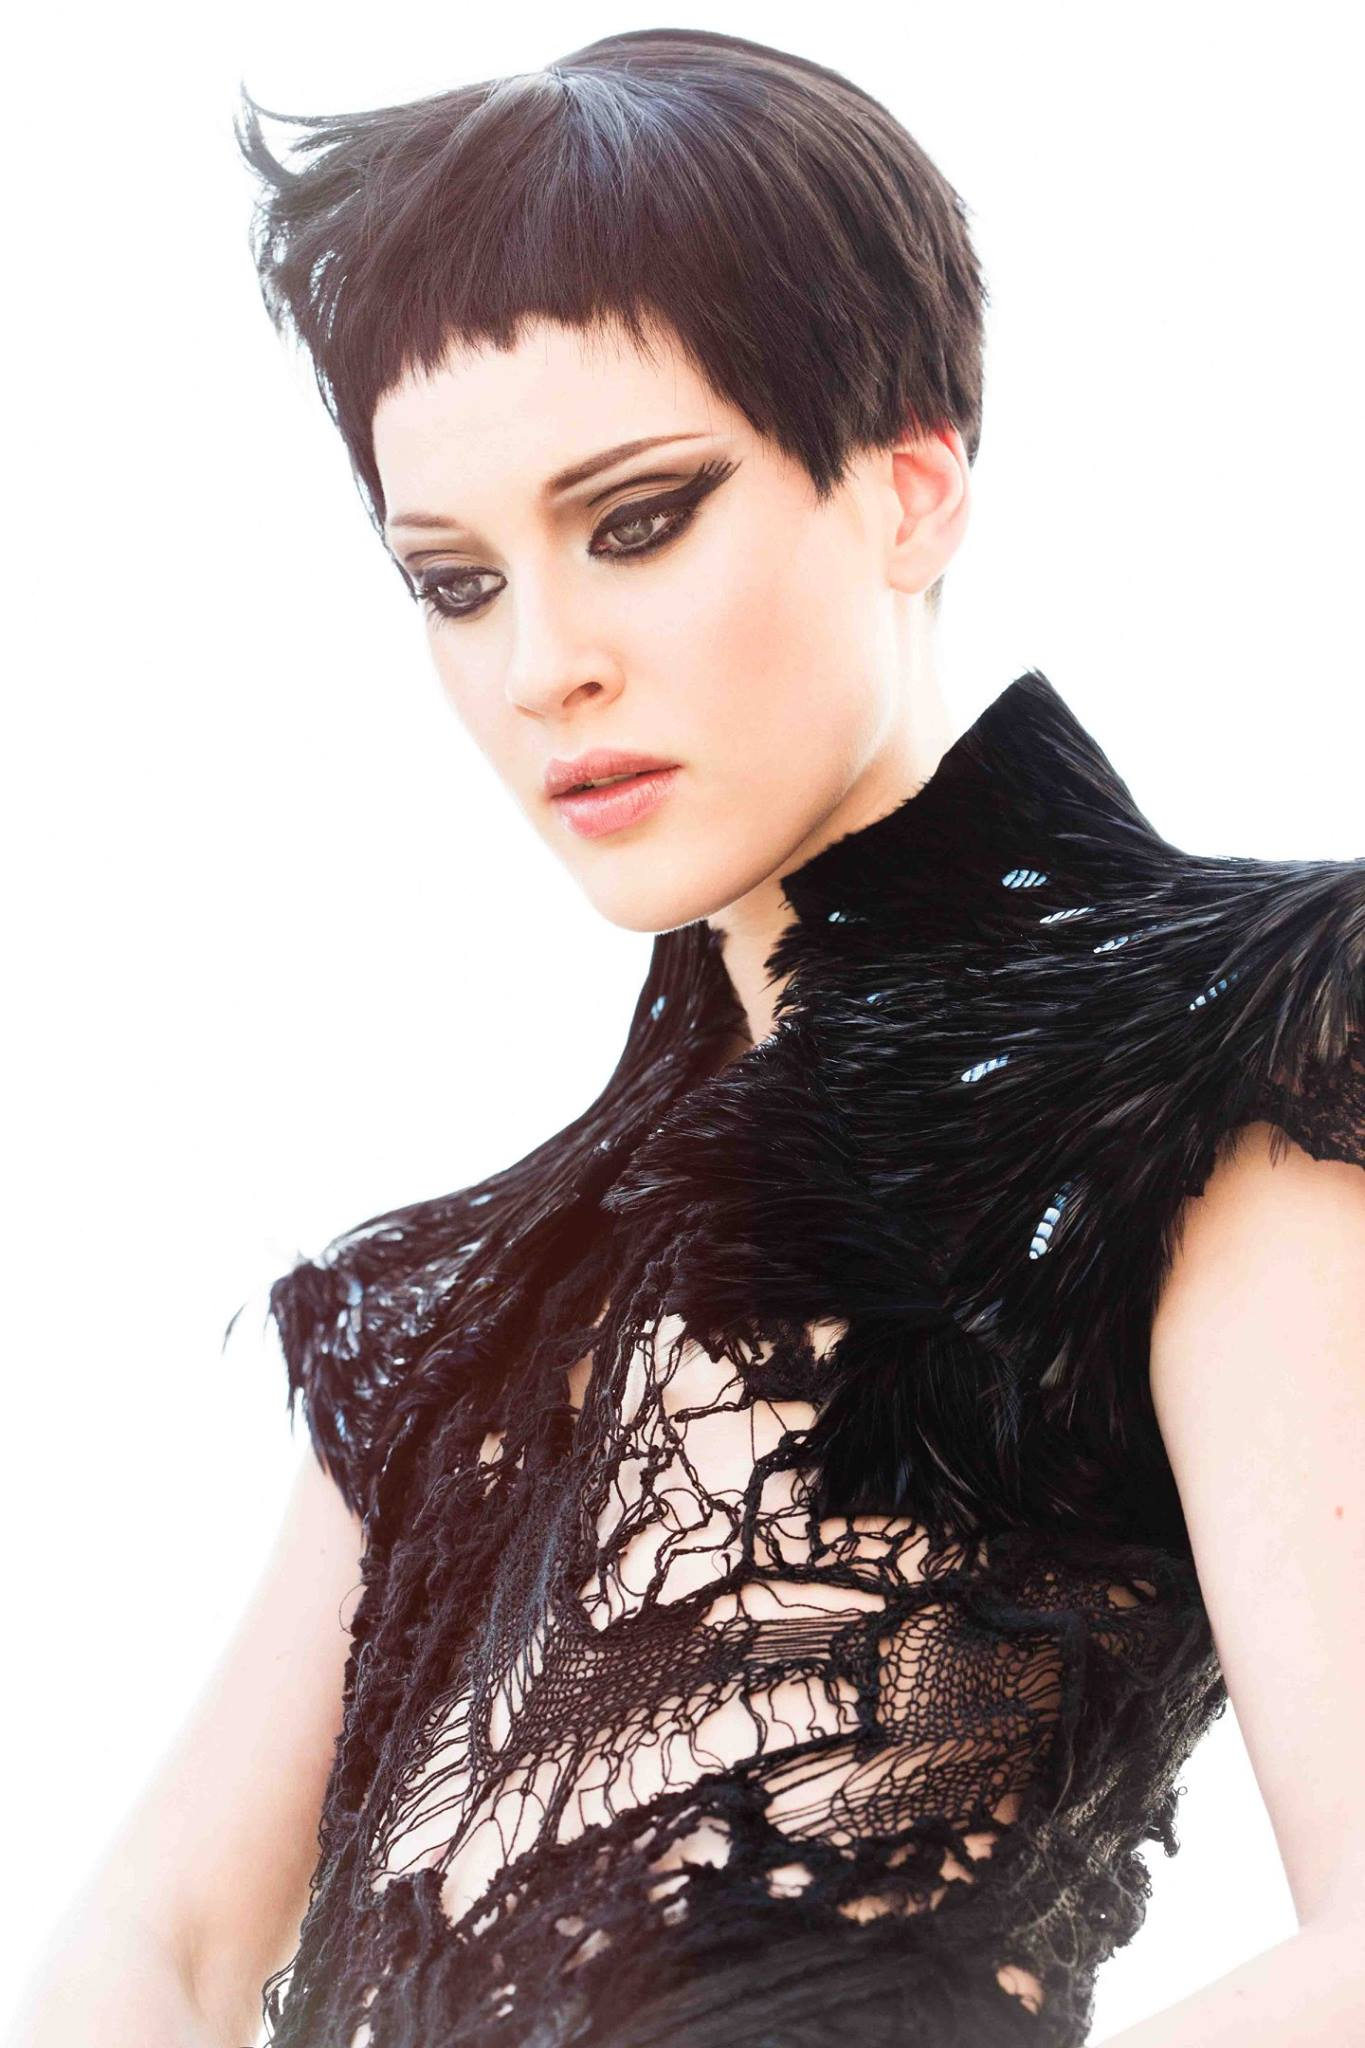 Iris berben at riani show mercedes benz fashion week berlin nude (54 photos), Selfie Celebrity image